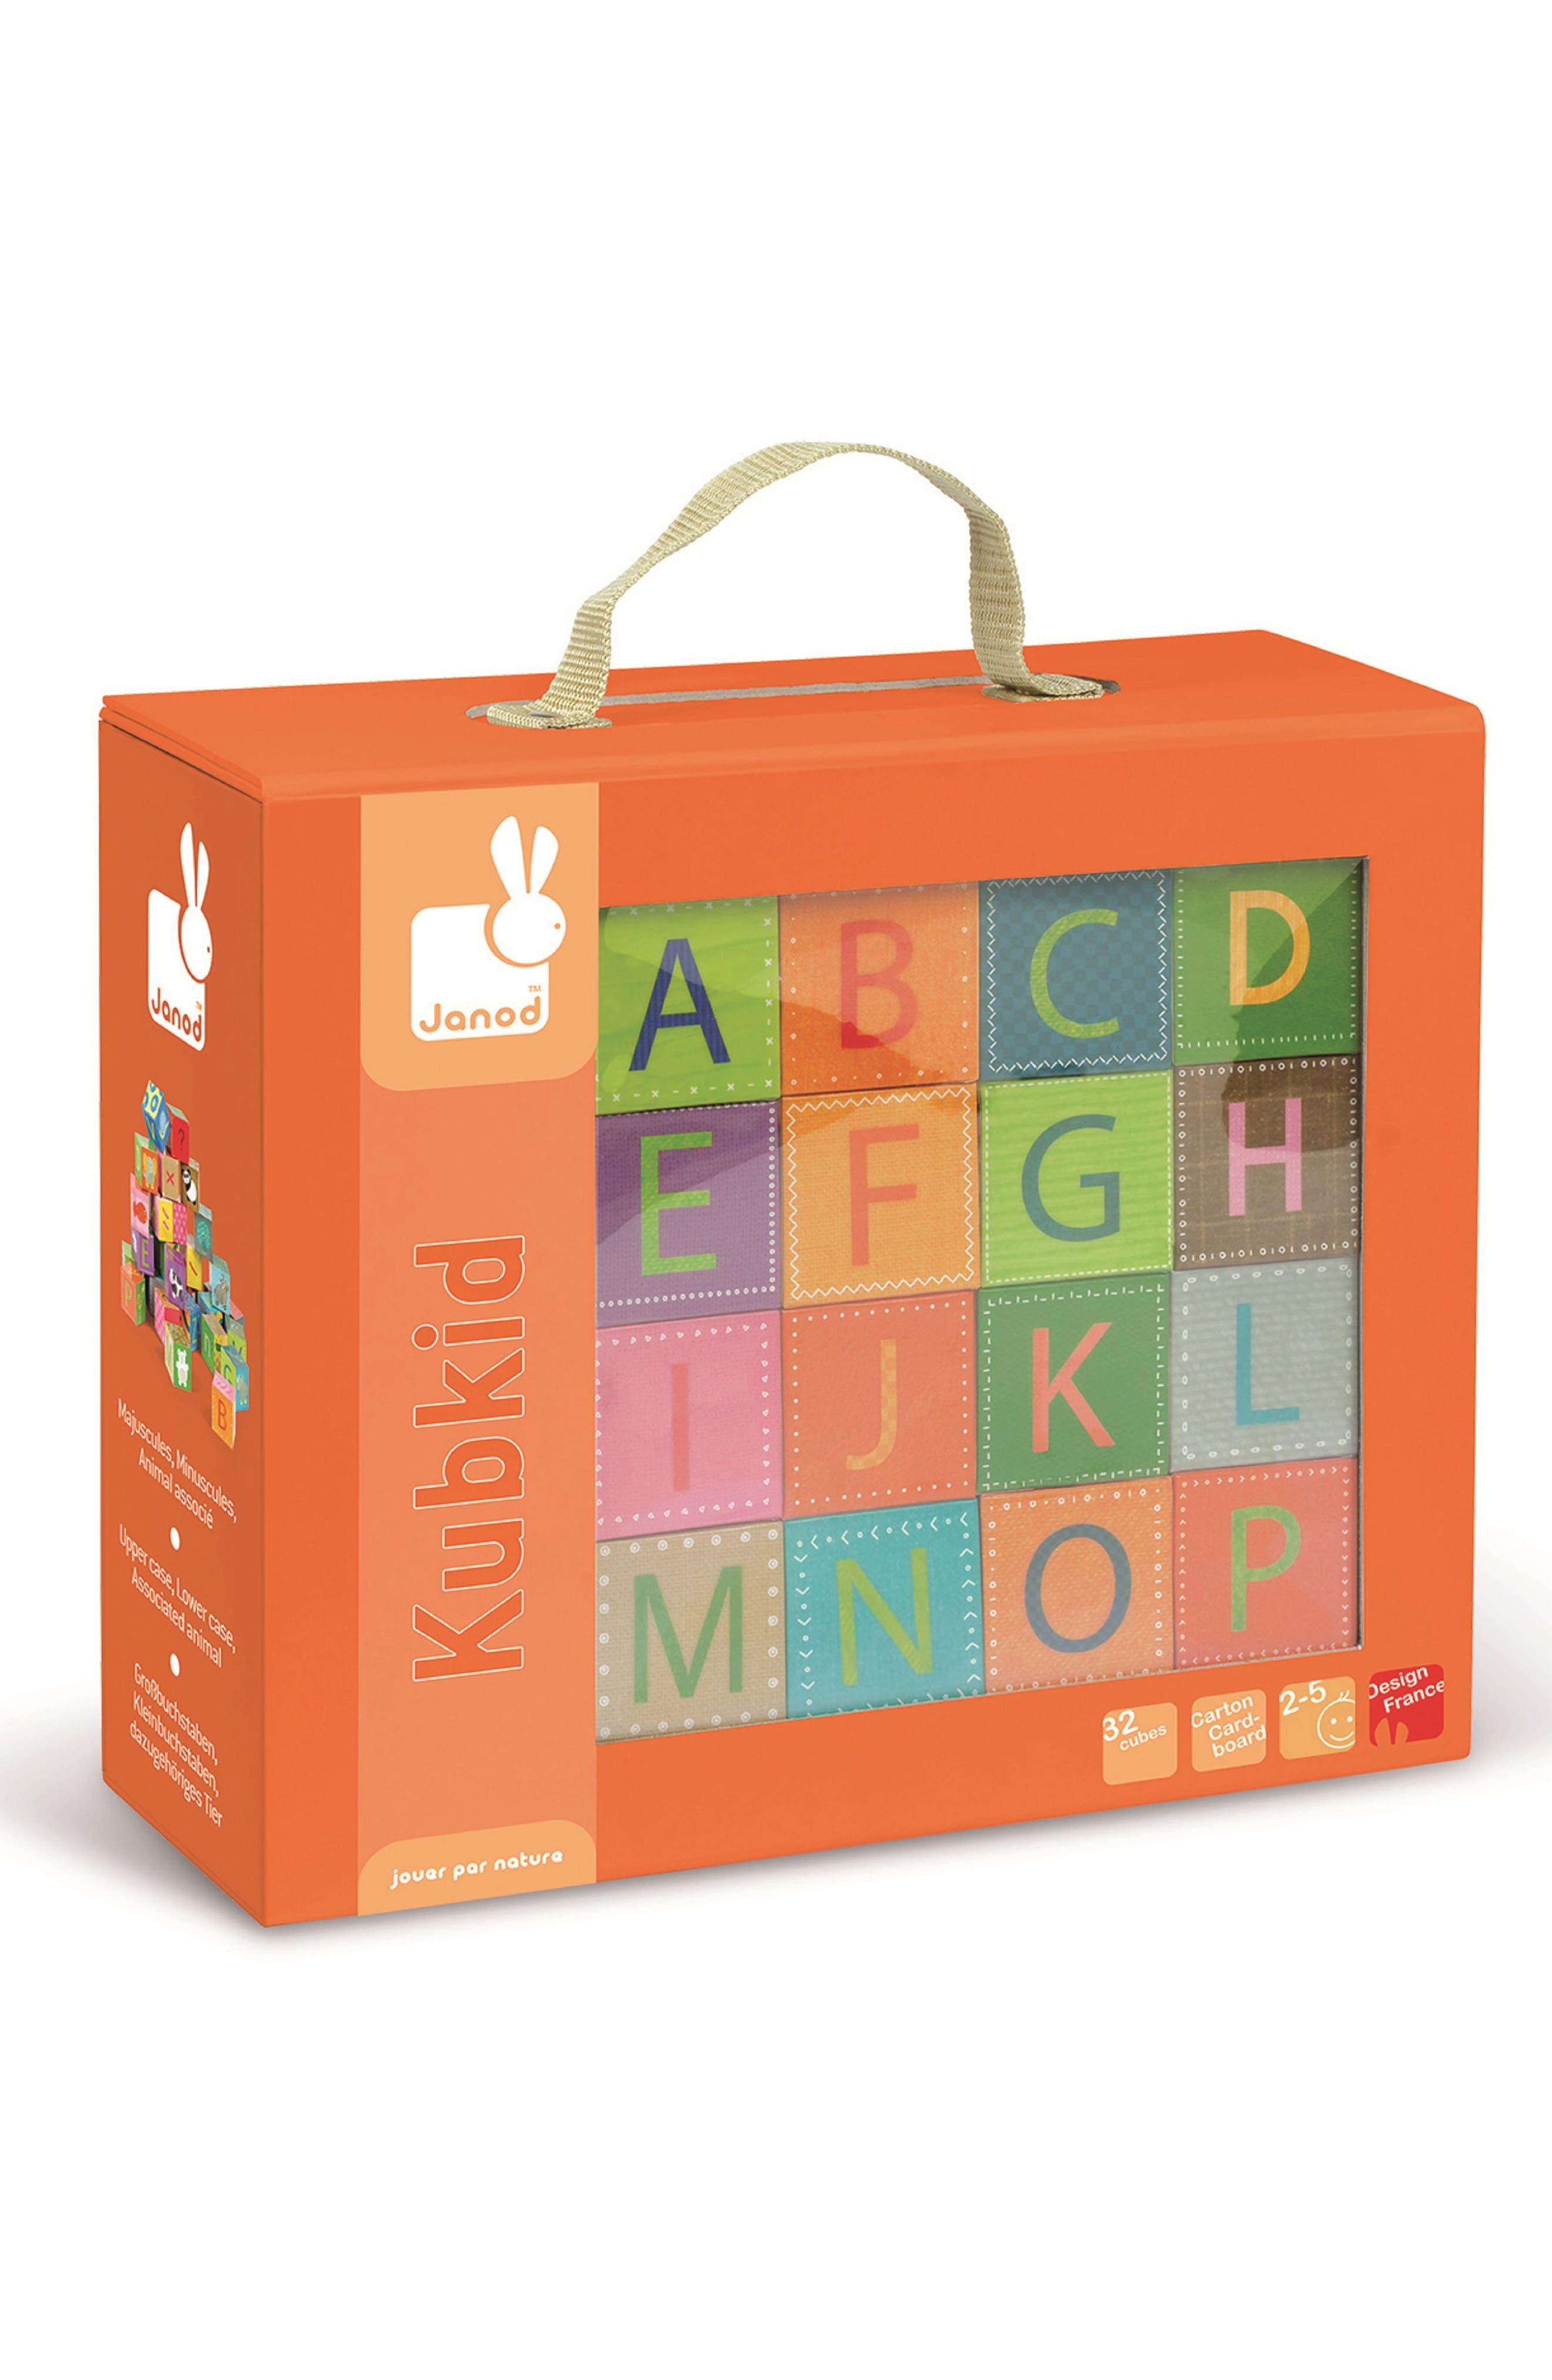 Janod Kubkid 32-Piece Block Set